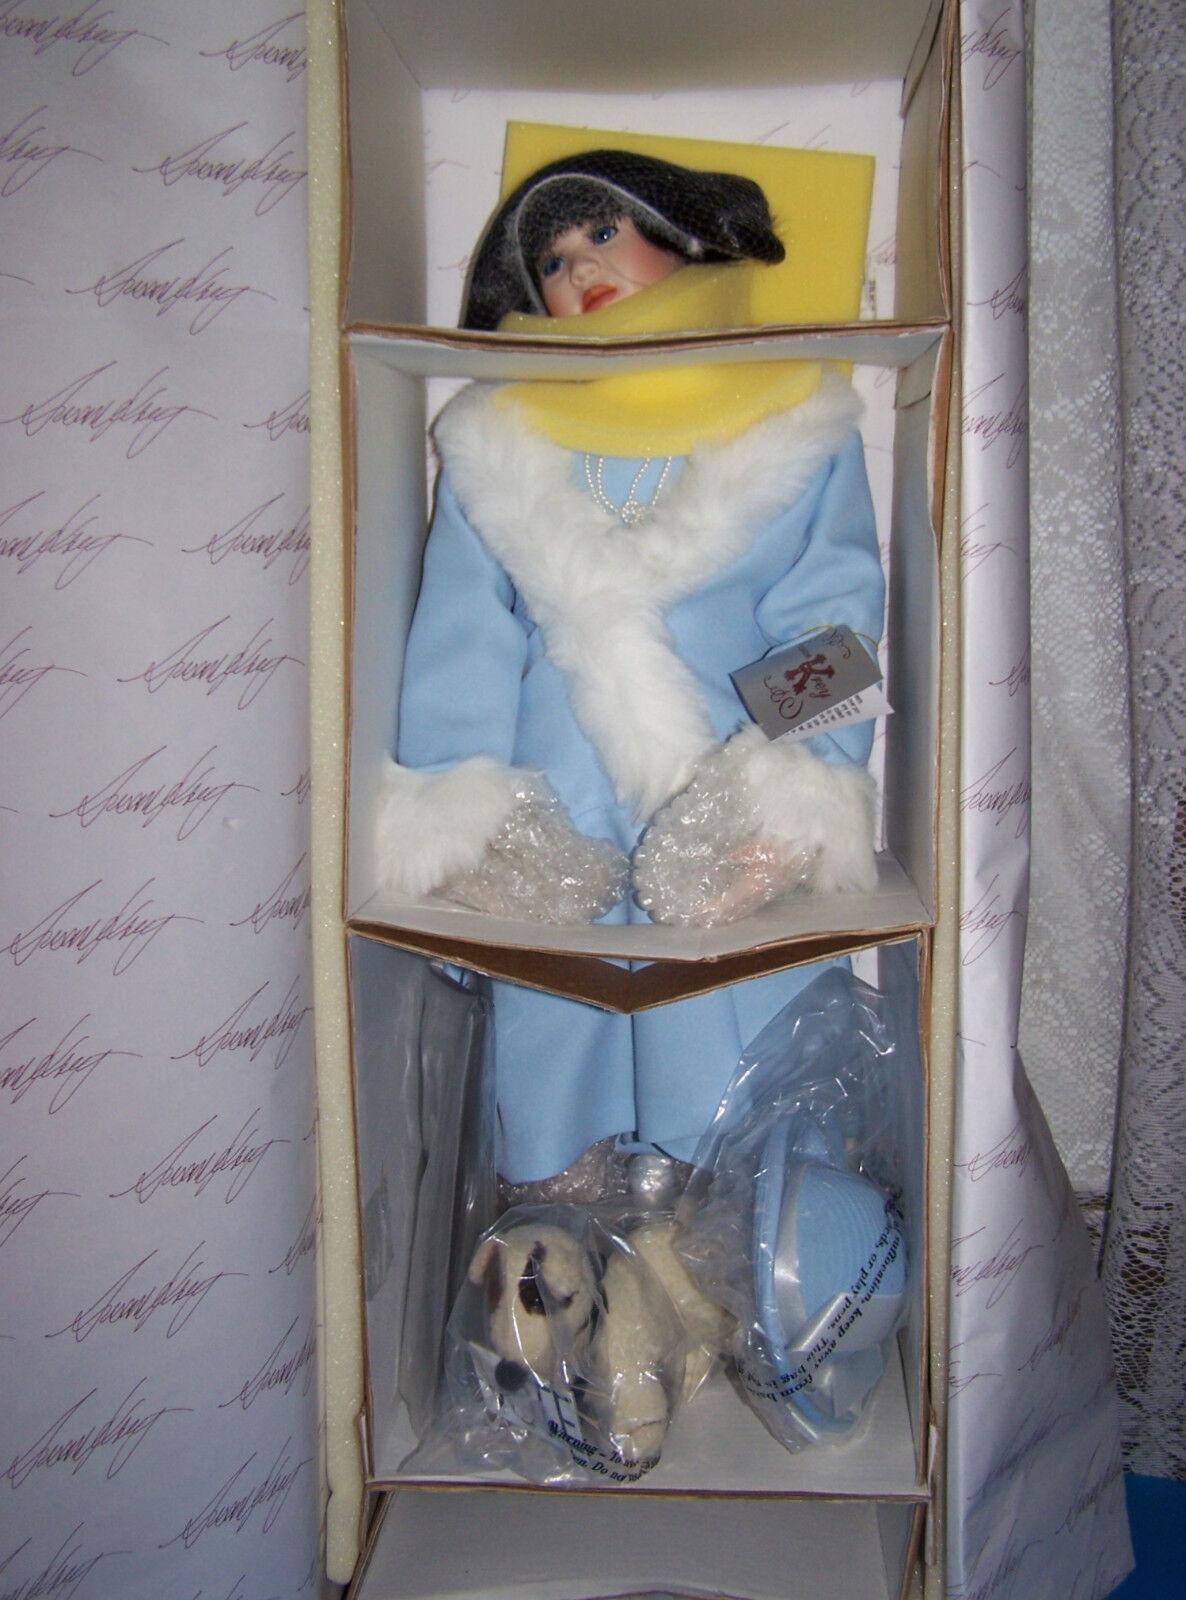 punto vendita Susan Krey 26 26 26  ELEANOR PORCELAIN bambola  20' style Collectible Concepts w DOG NRFB  edizione limitata